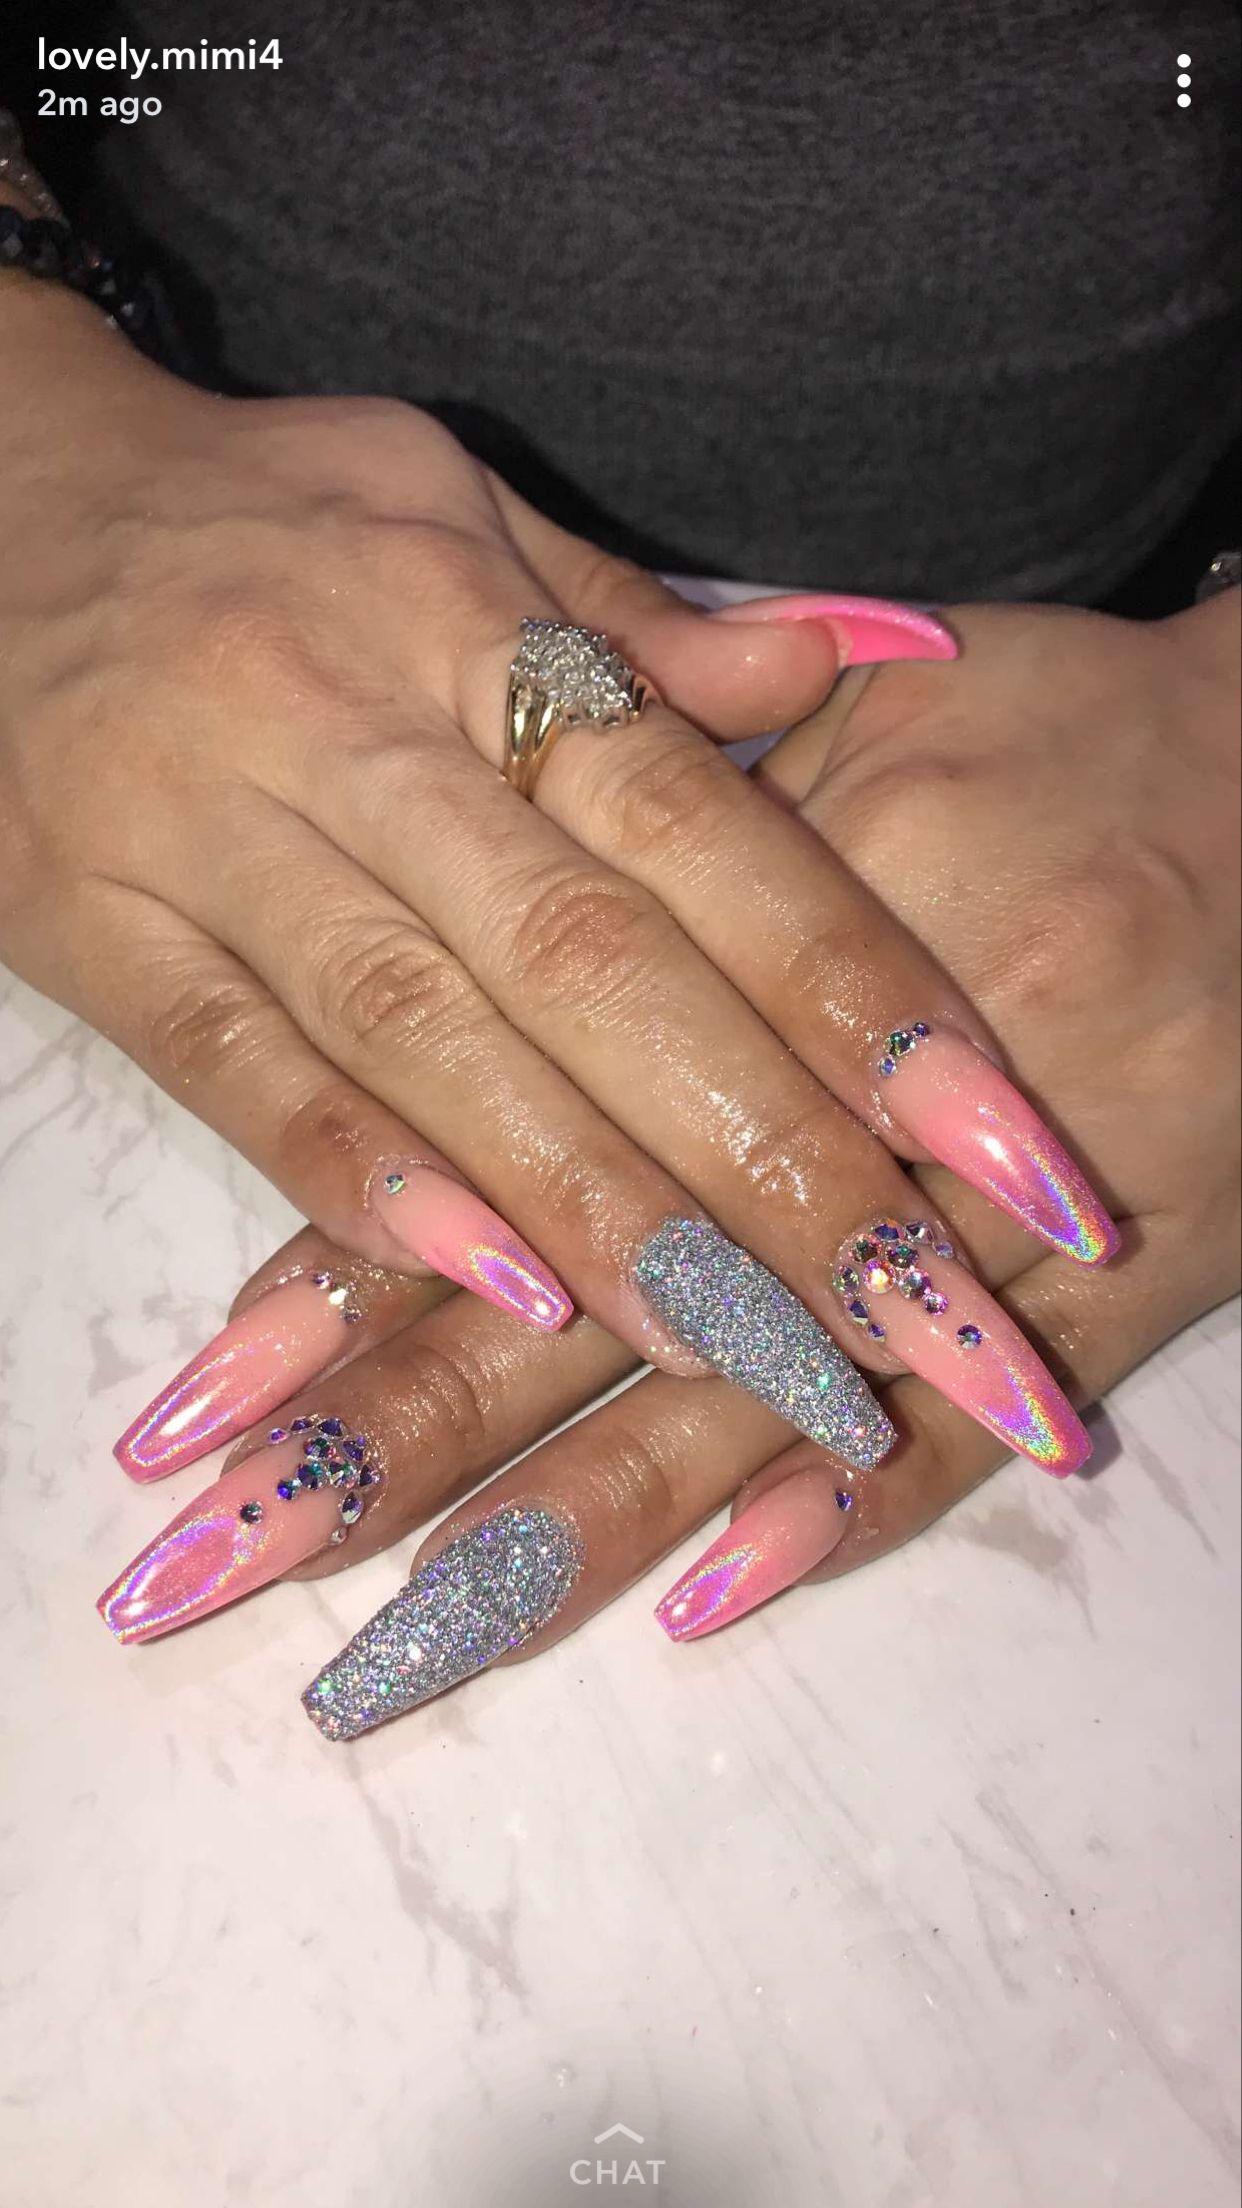 Lovely Mimi Nails : lovely, nails, Nails, Lovelymimi, Luxury, Nails,, Designs